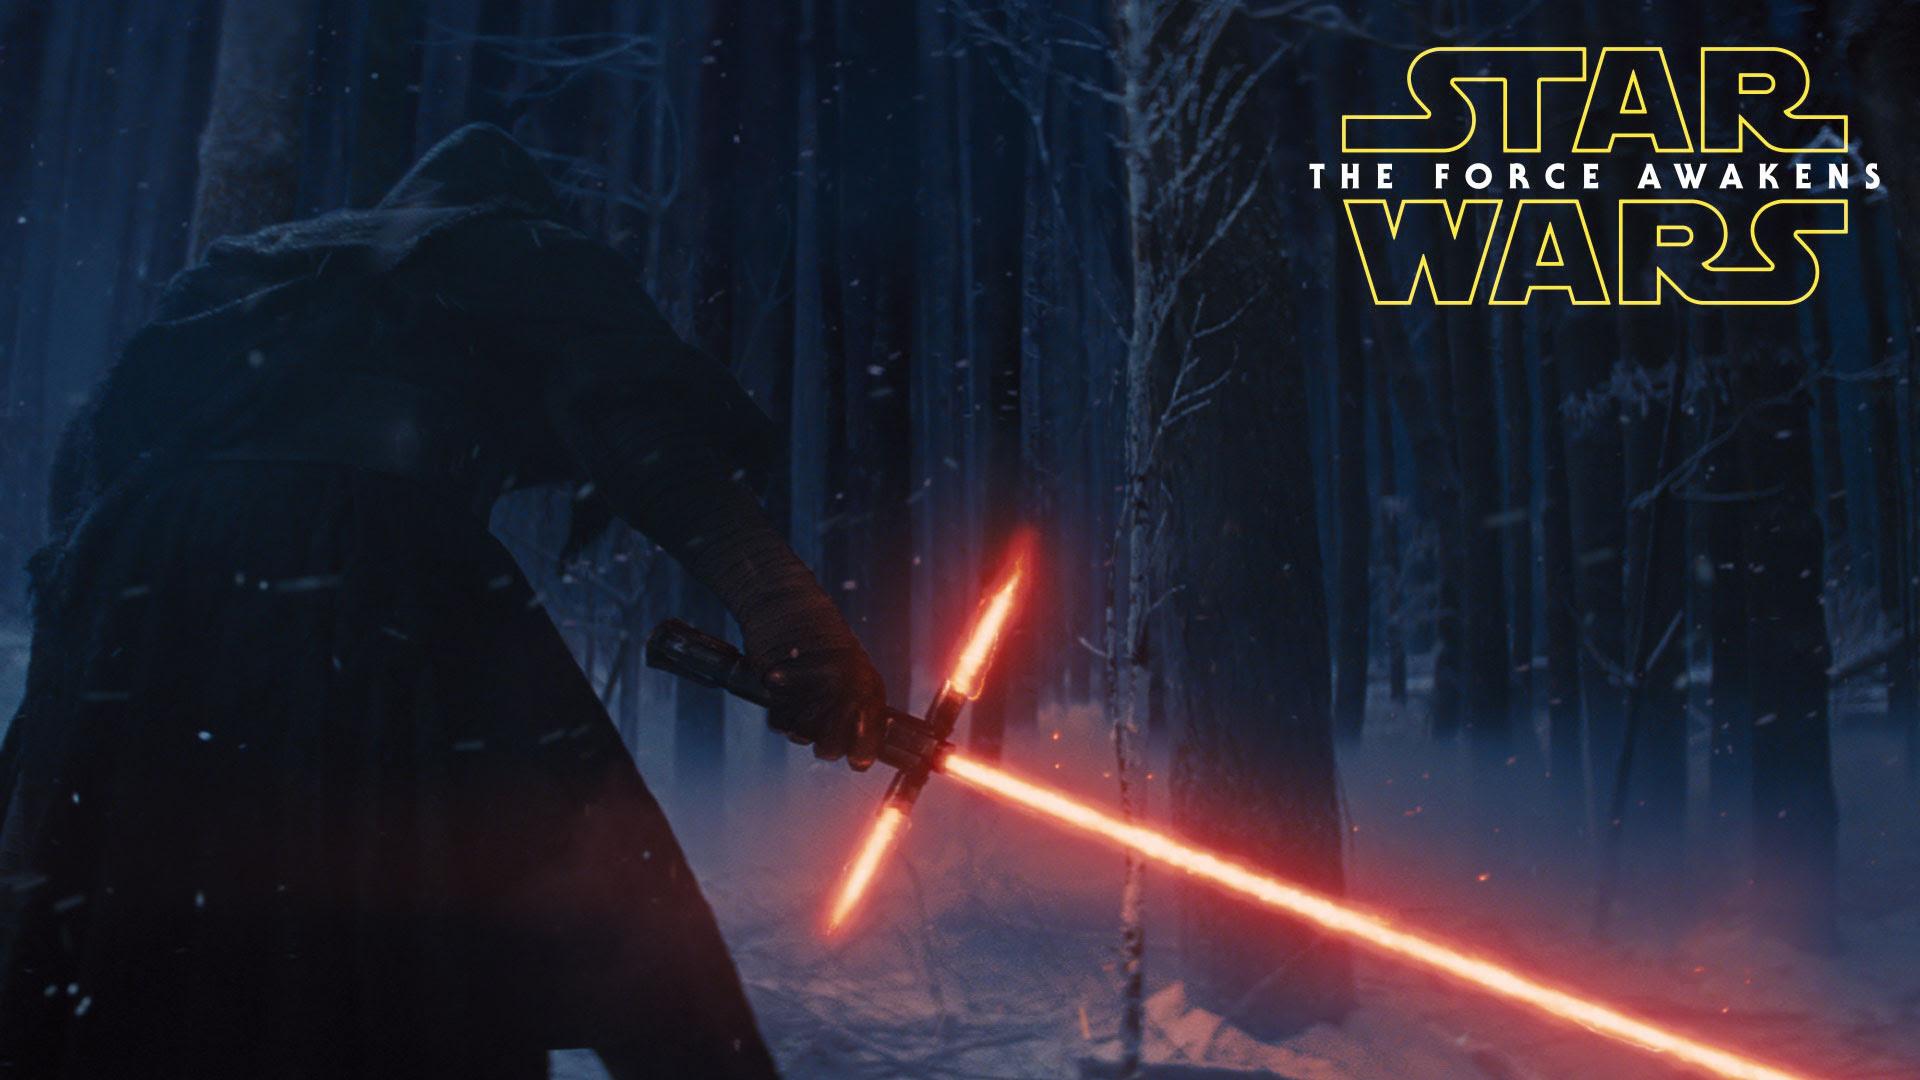 Star Wars The Force Awakens Wallpaper 2